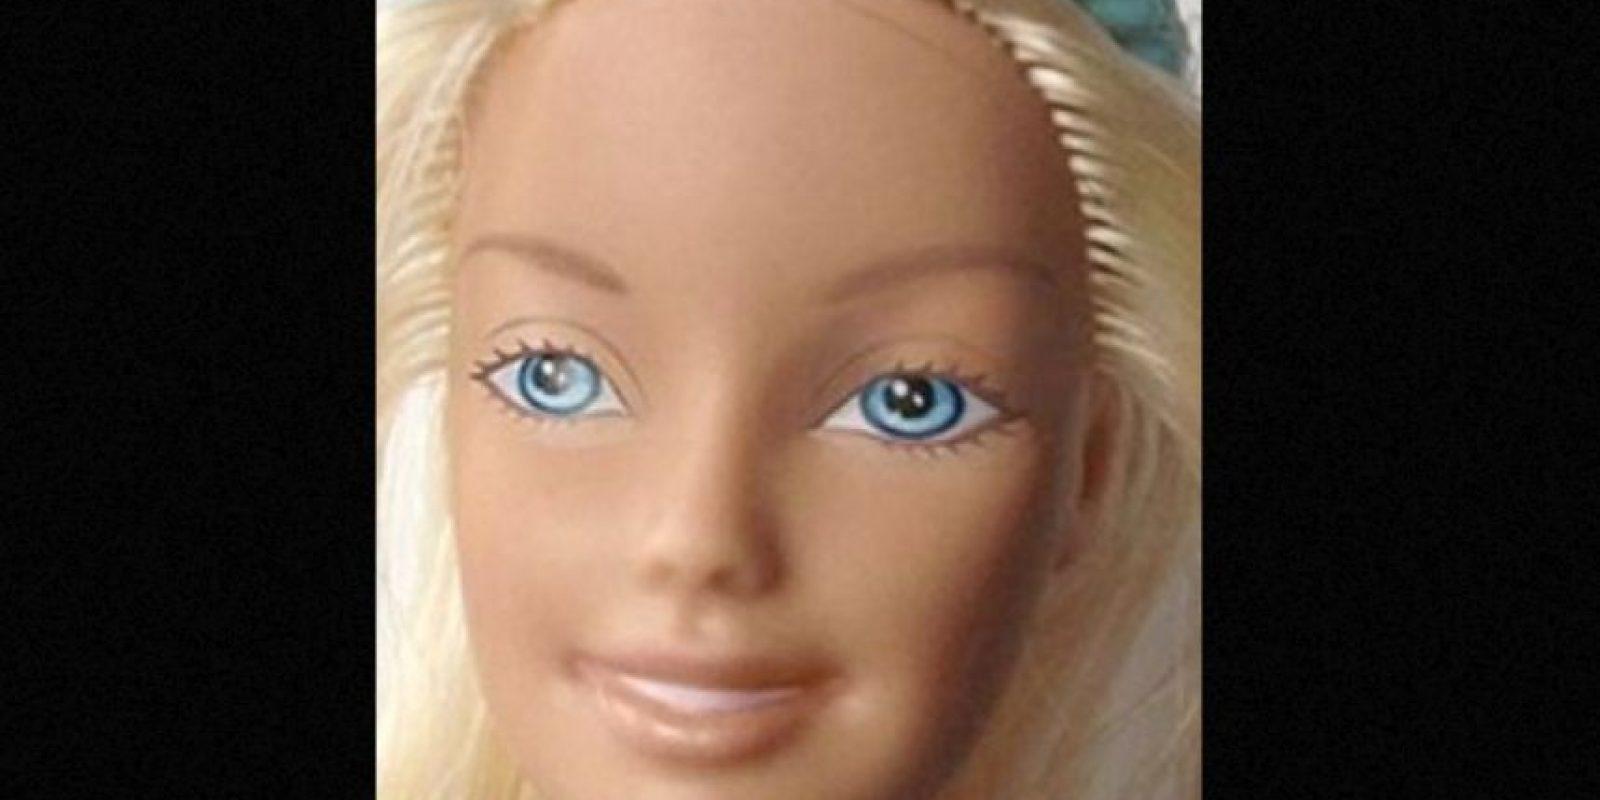 El mexicano Eddi Aguirre se hizo famoso por mostrar a la Barbie sin maquillaje Foto:Behance